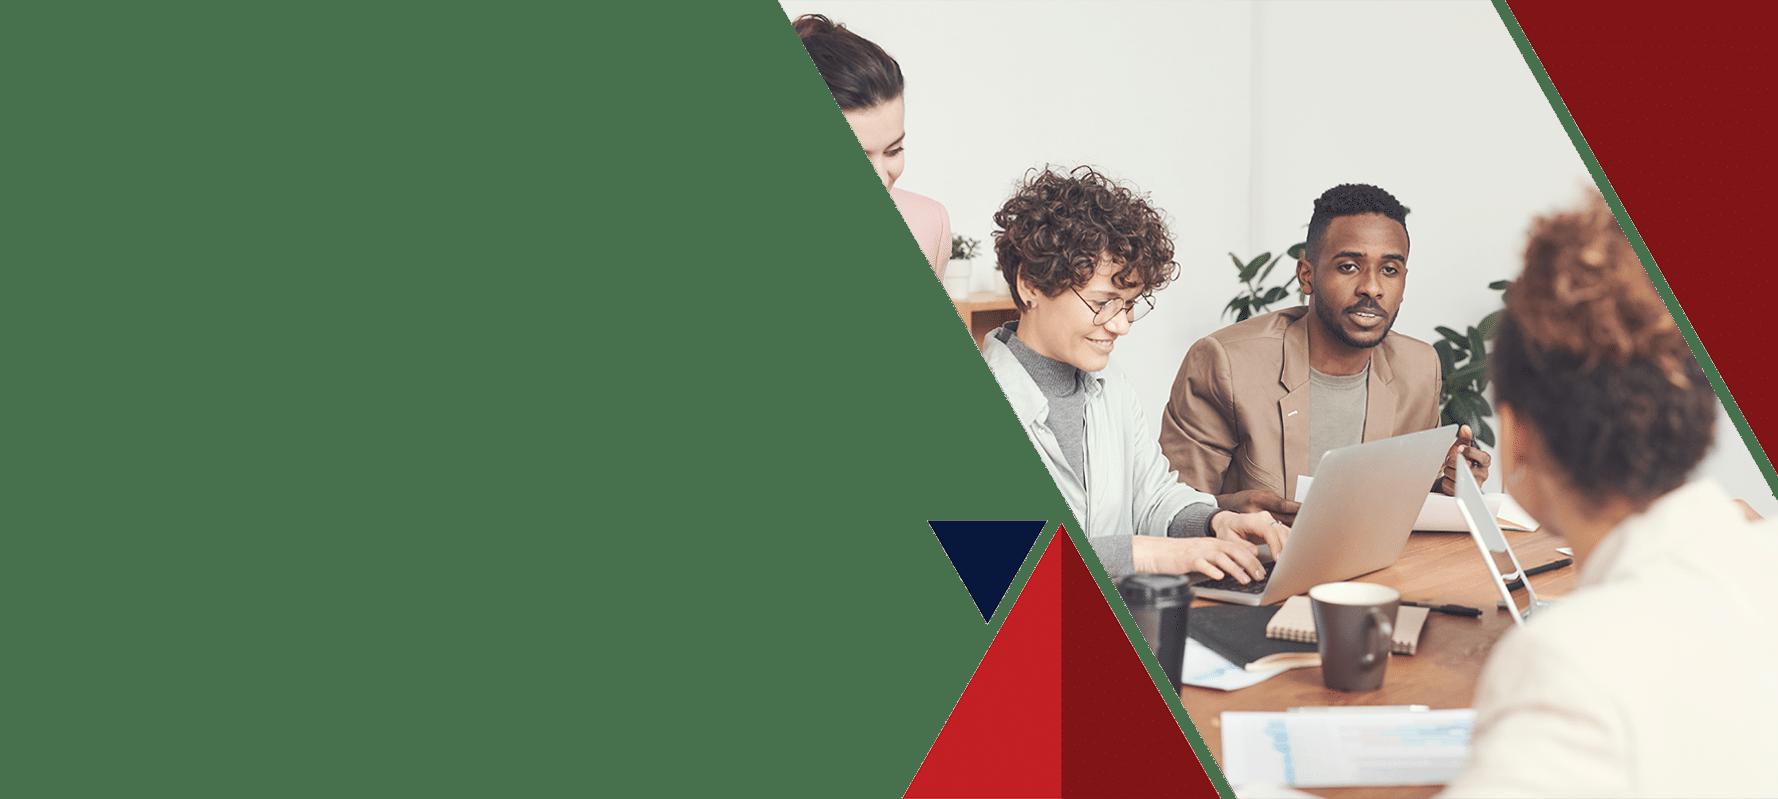 Kinetix Software Services - Field Management